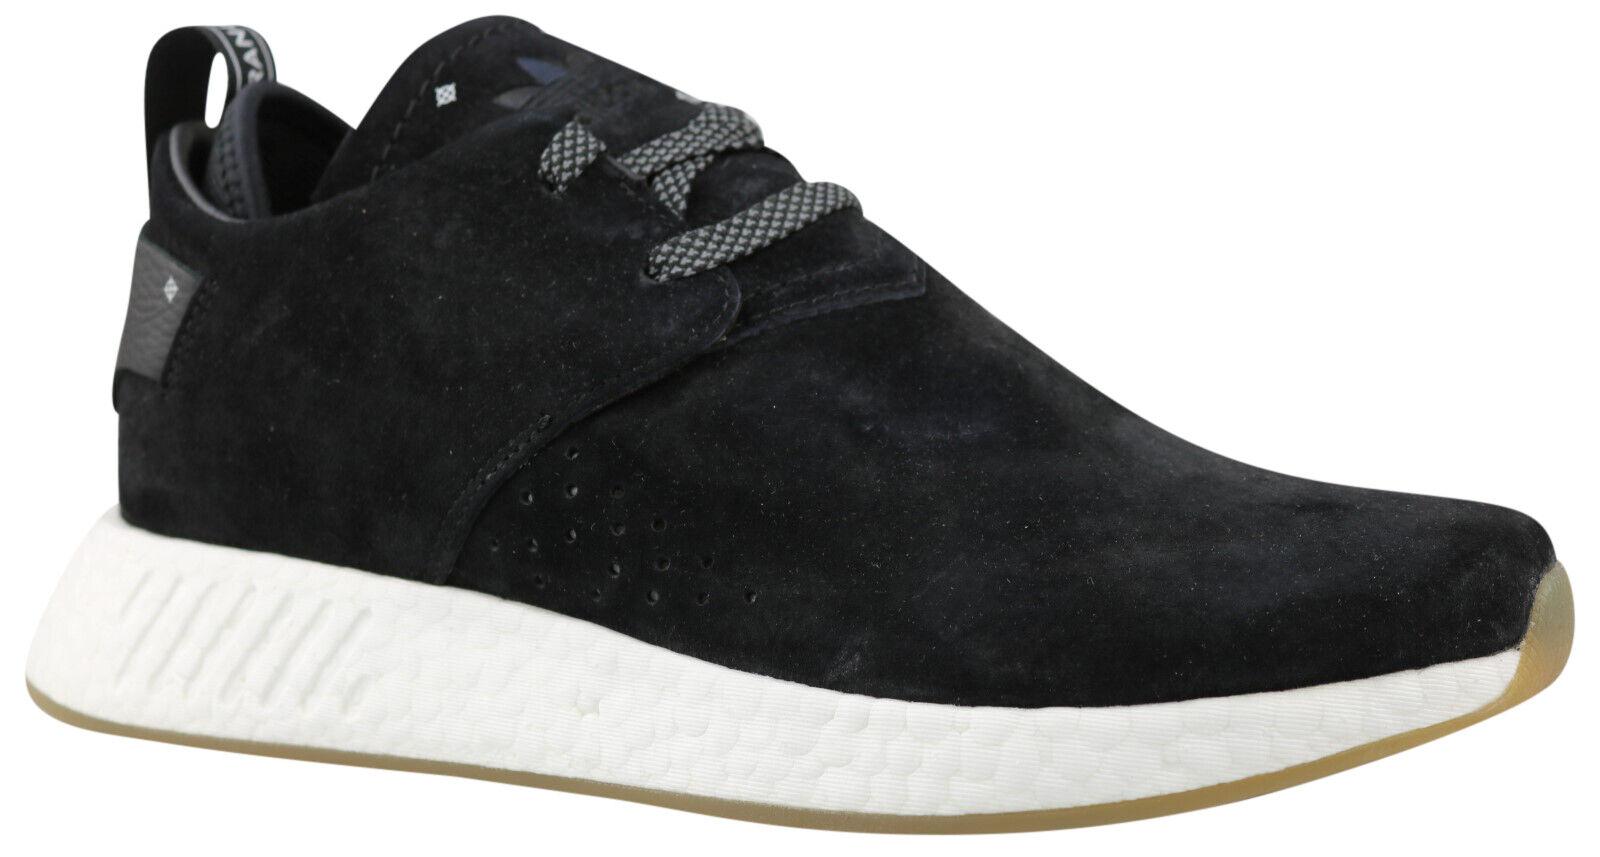 Adidas NMD C2 Herren Turnschuhe Turnschuhe schwarz Leder BY3011 Gr. 36,5 - 43 NEU